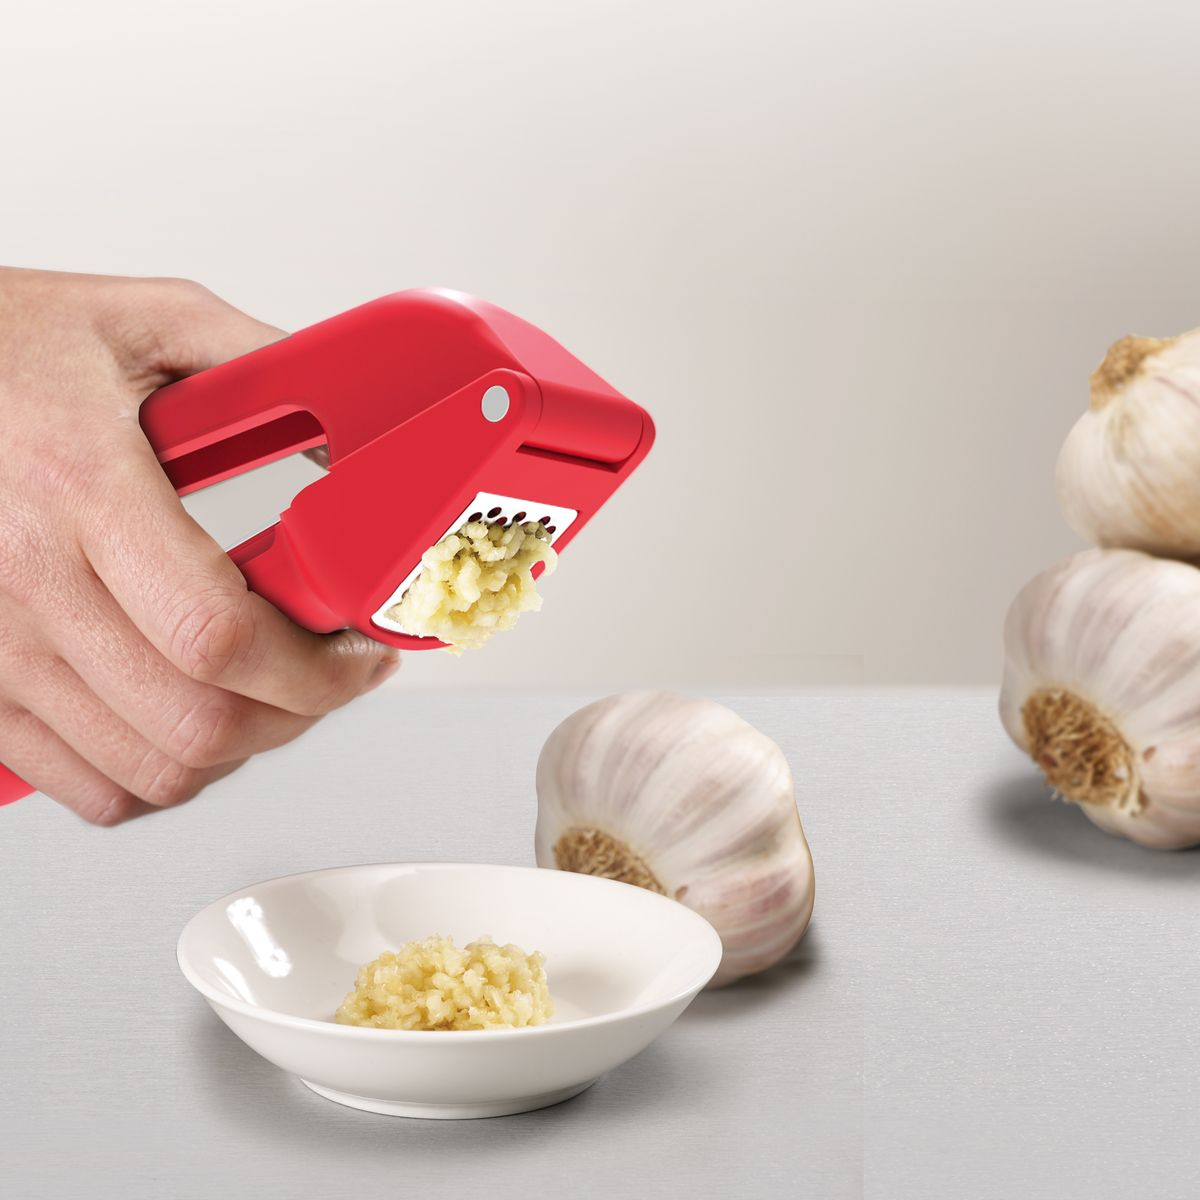 Joseph Joseph Duo Red Garlic Peeler Red